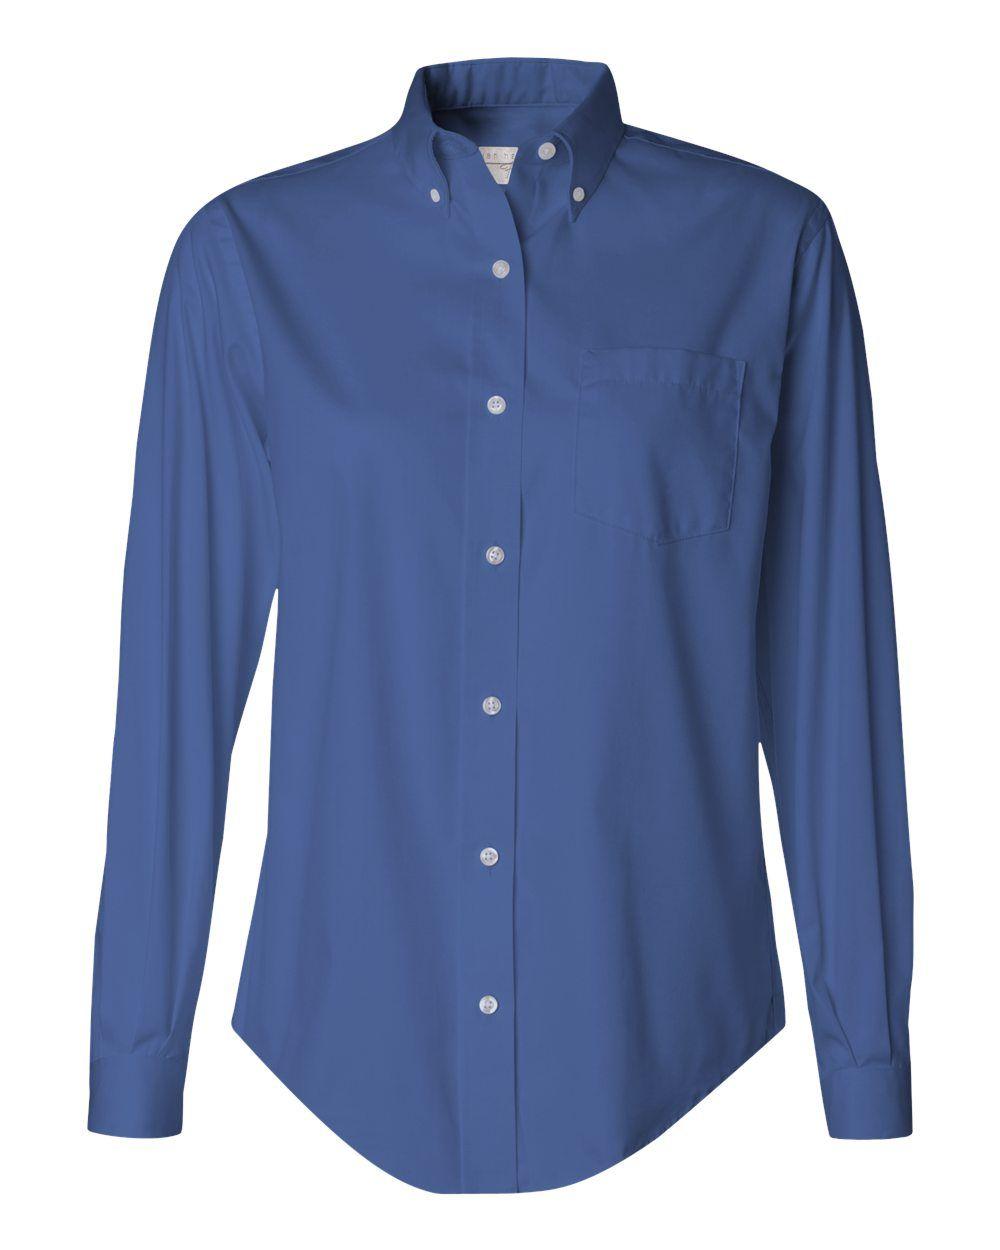 English Blue Ladies Pinpoint Oxford Shirt From Van Heusen - 13V0110